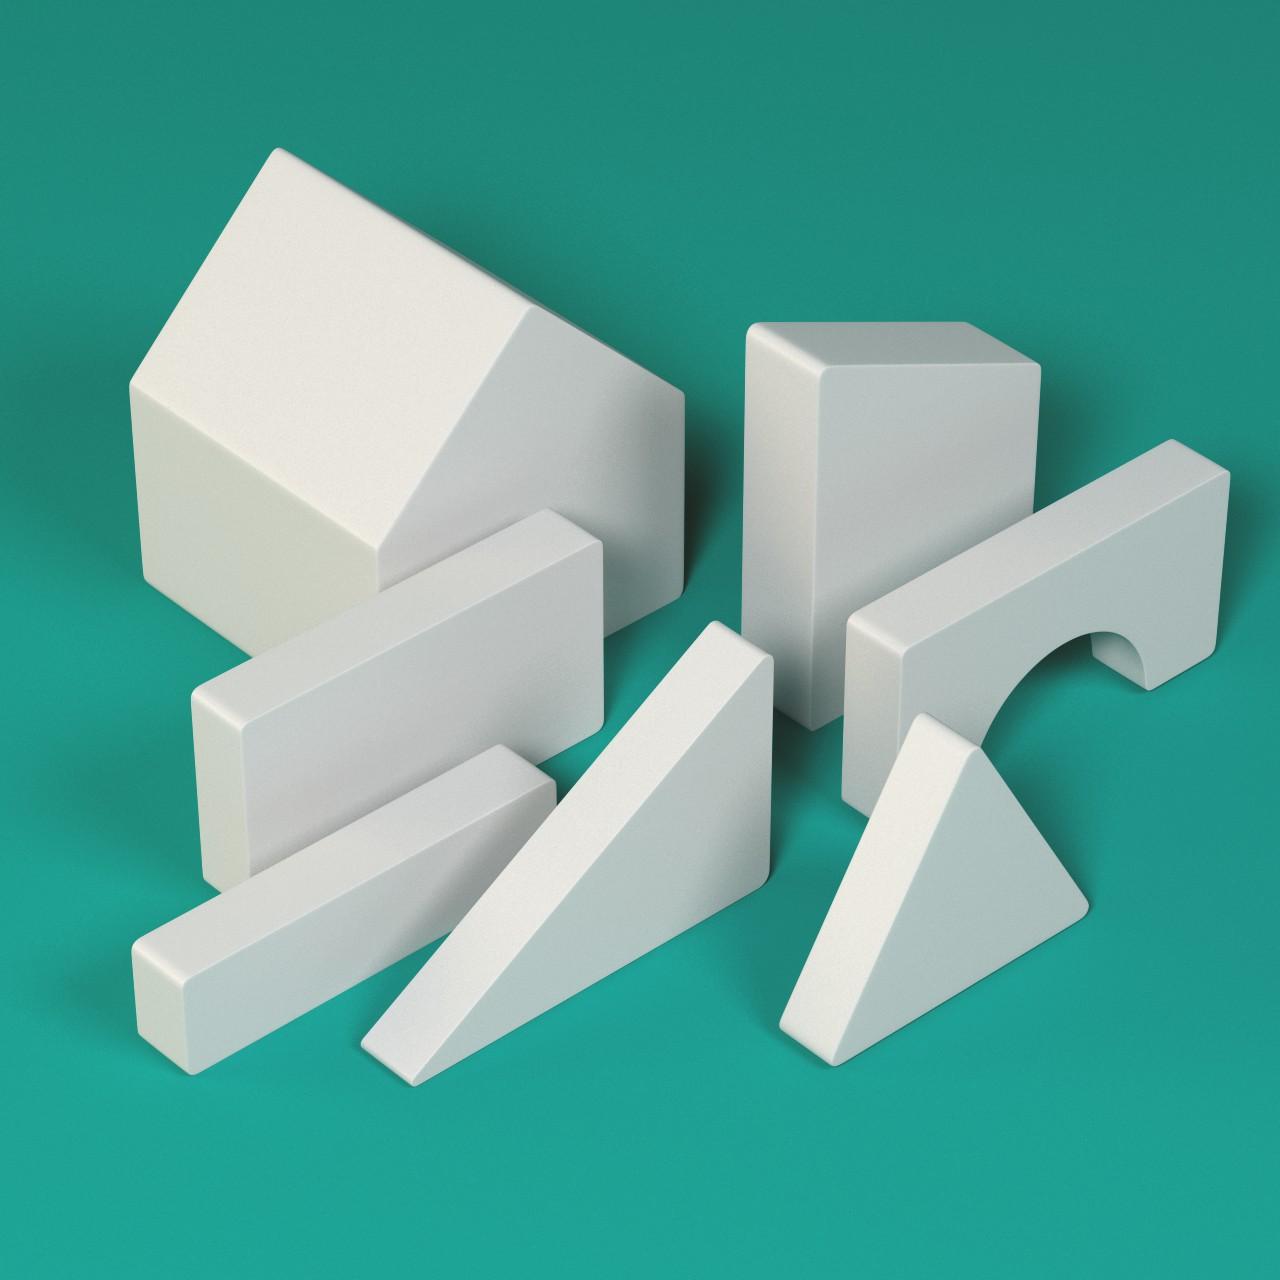 simple_blocks_v1_1.jpg